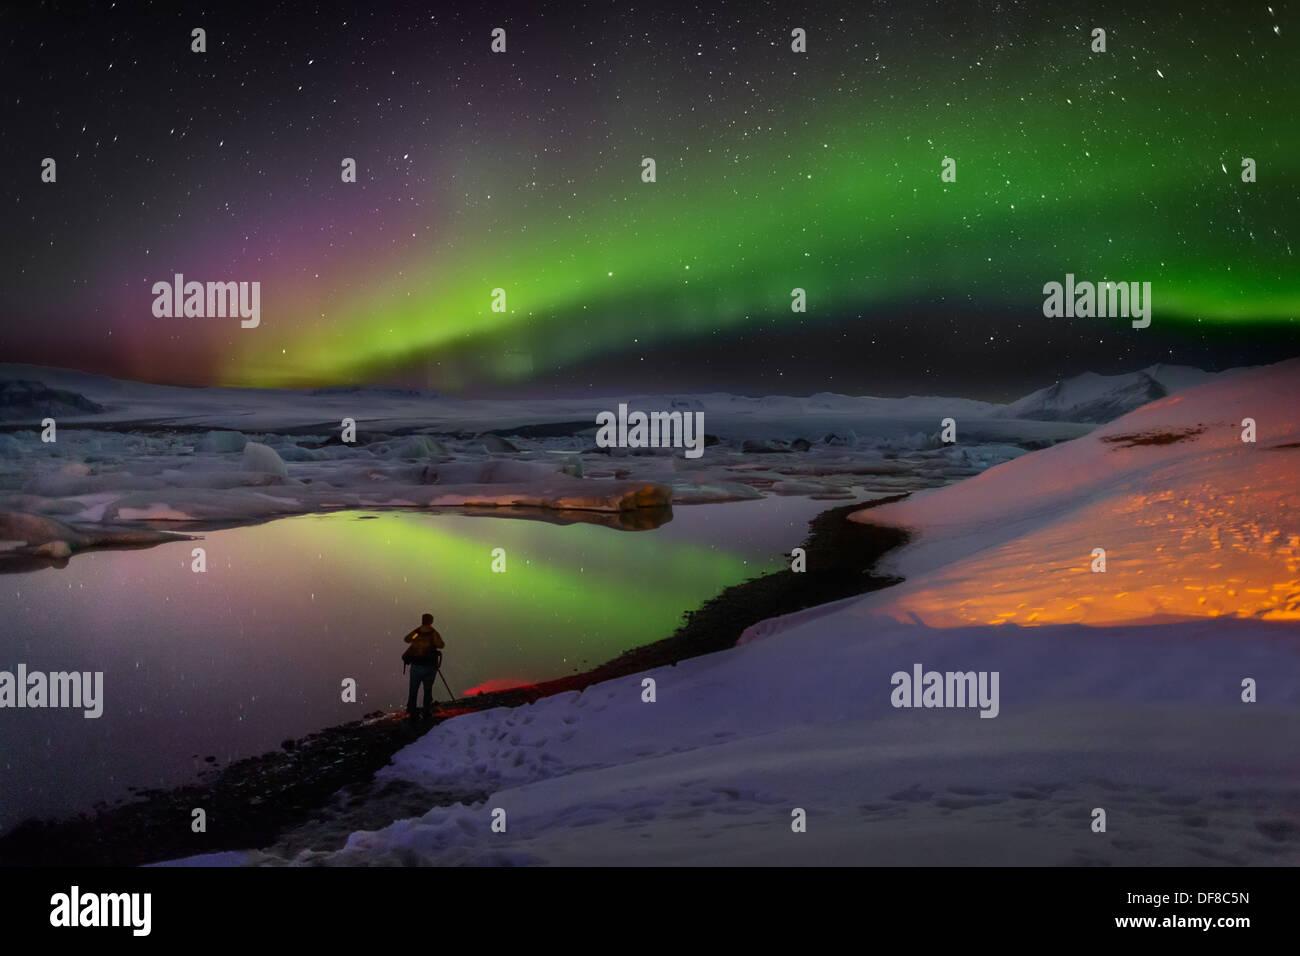 Taking pictures of the Northern Lights at the Jokulsarlon, Breidarmerkurjokull, Vatnajokull Ice Cap, Iceland. - Stock Image